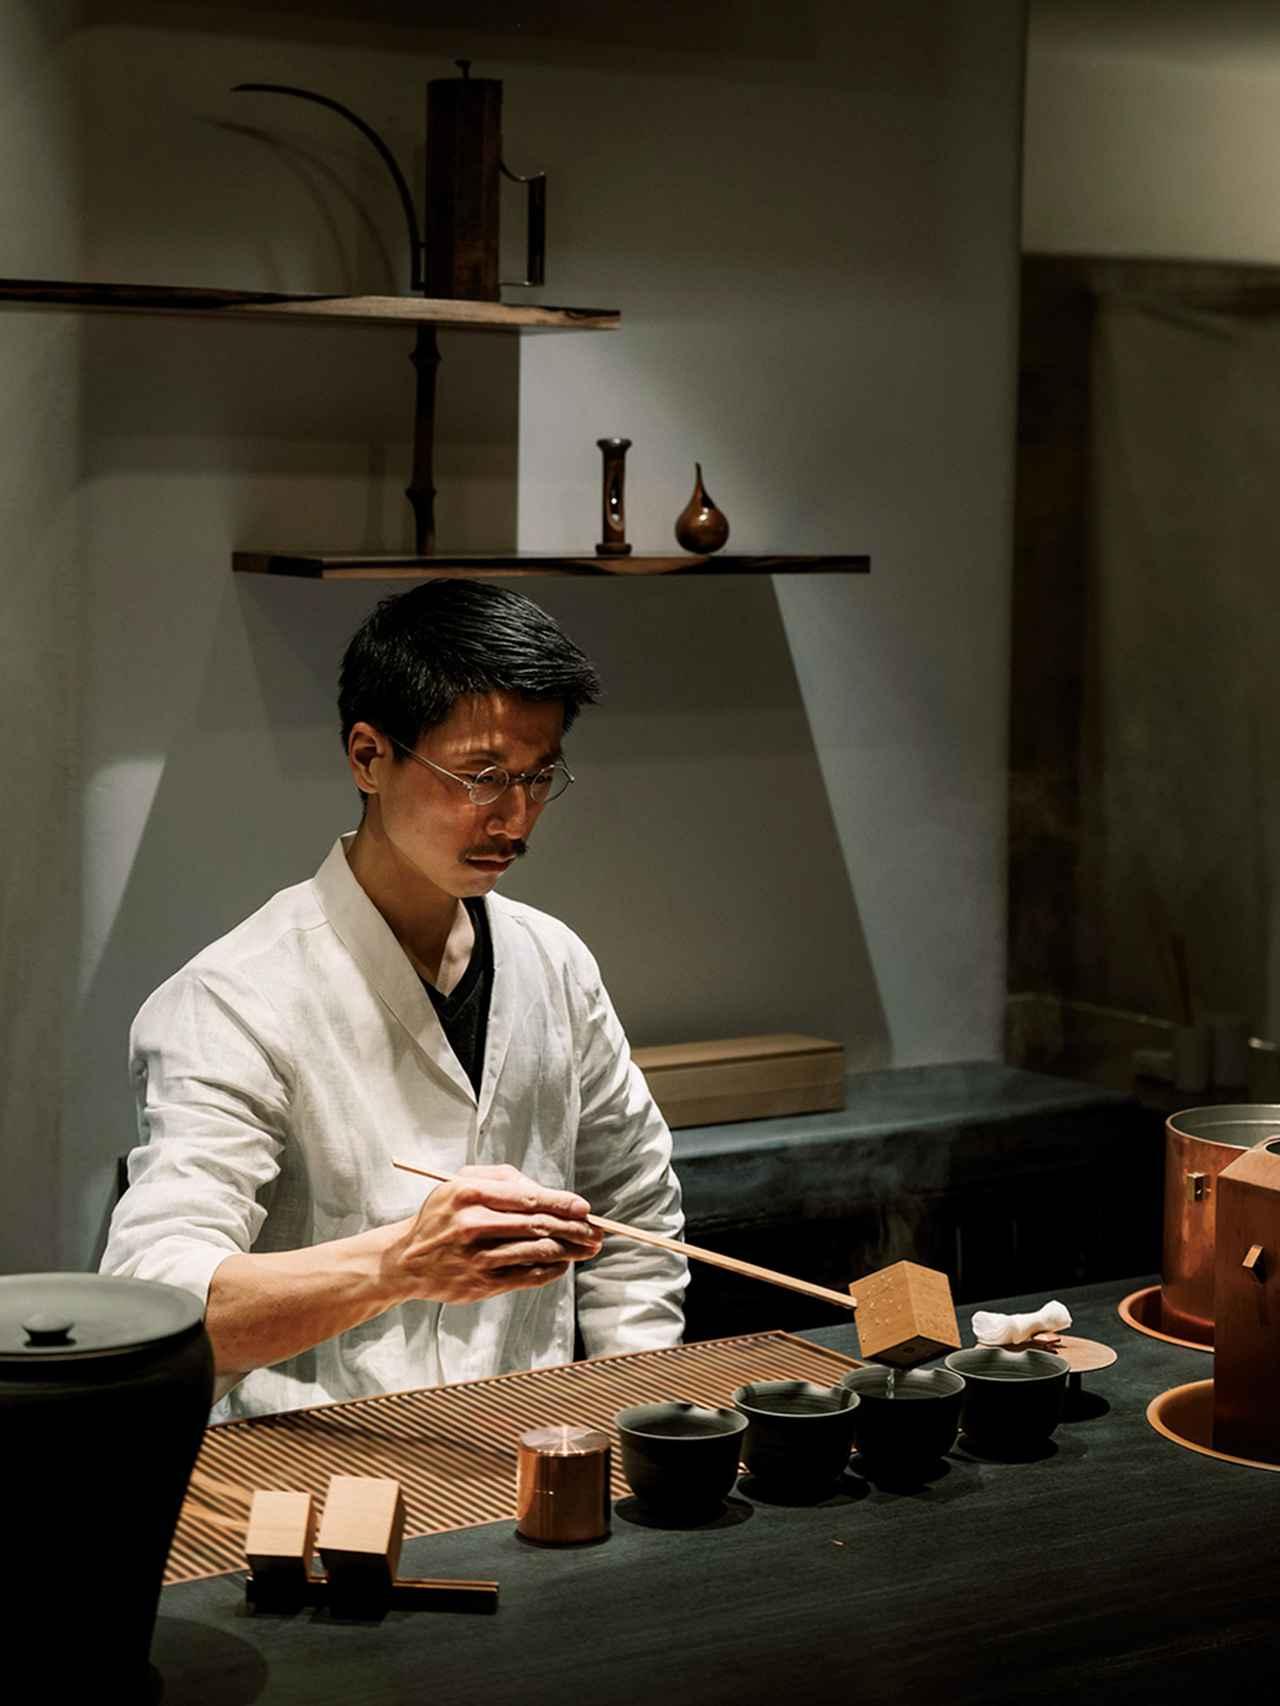 Images : 8番目の画像 - 「OGATA Paris ーー パリの空間に映る 日本の食とデザインの粋」のアルバム - T JAPAN:The New York Times Style Magazine 公式サイト